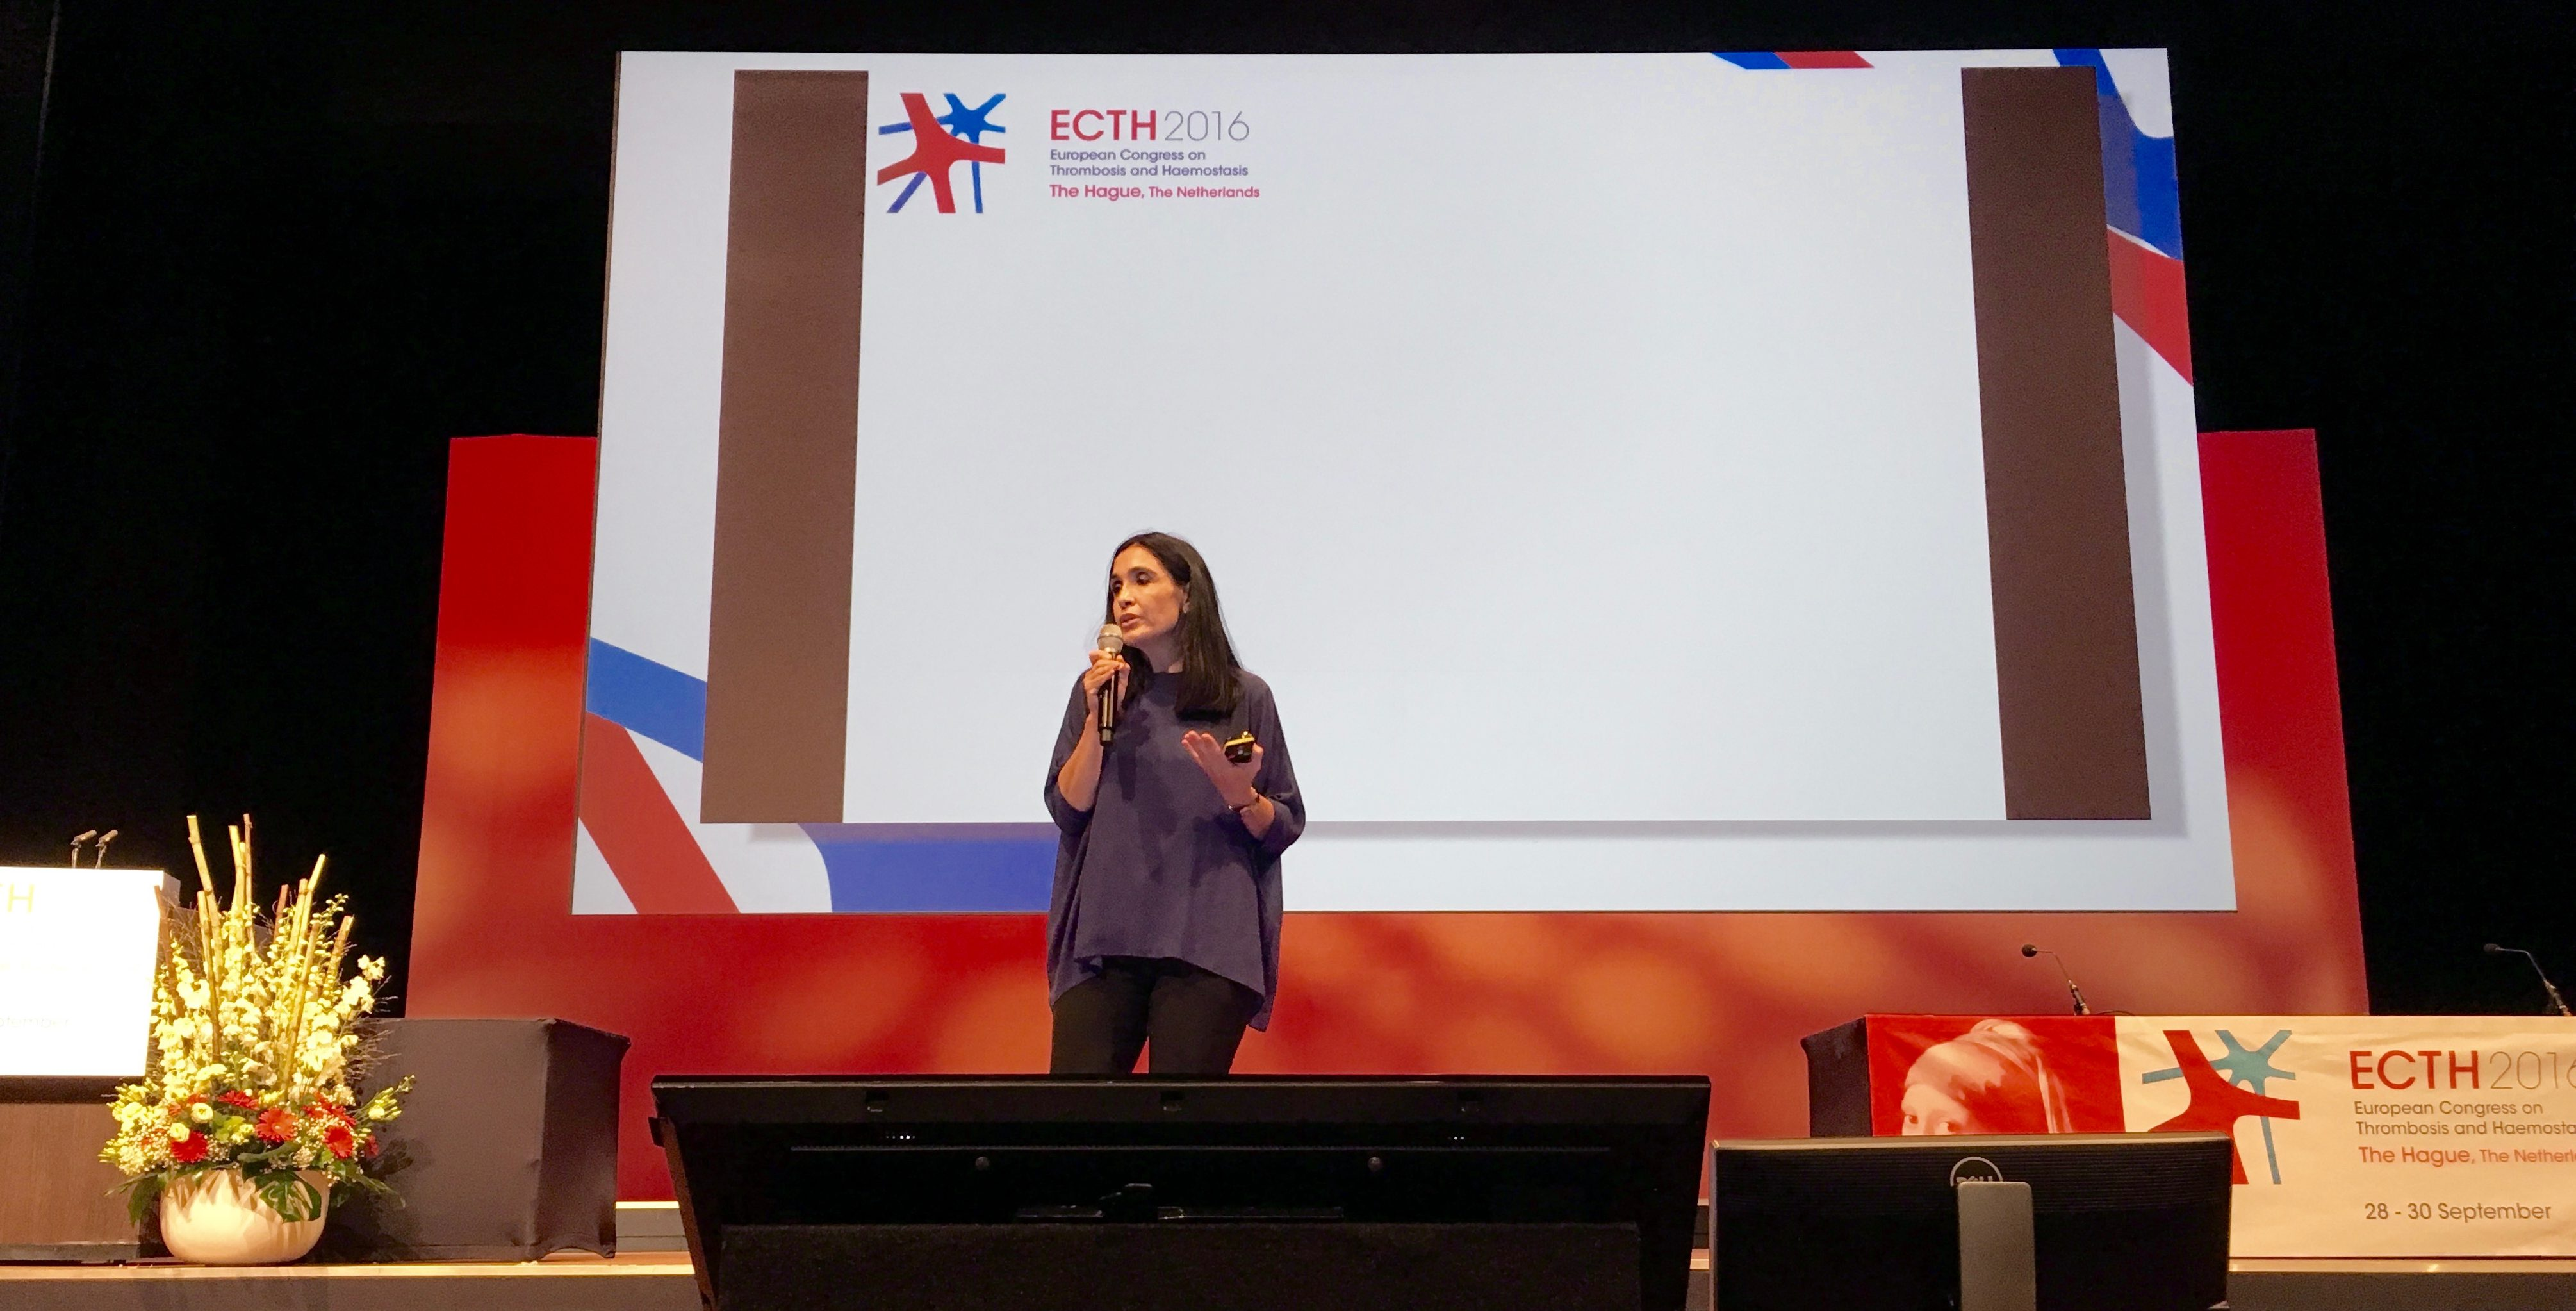 ECTH2016 speaker presentation